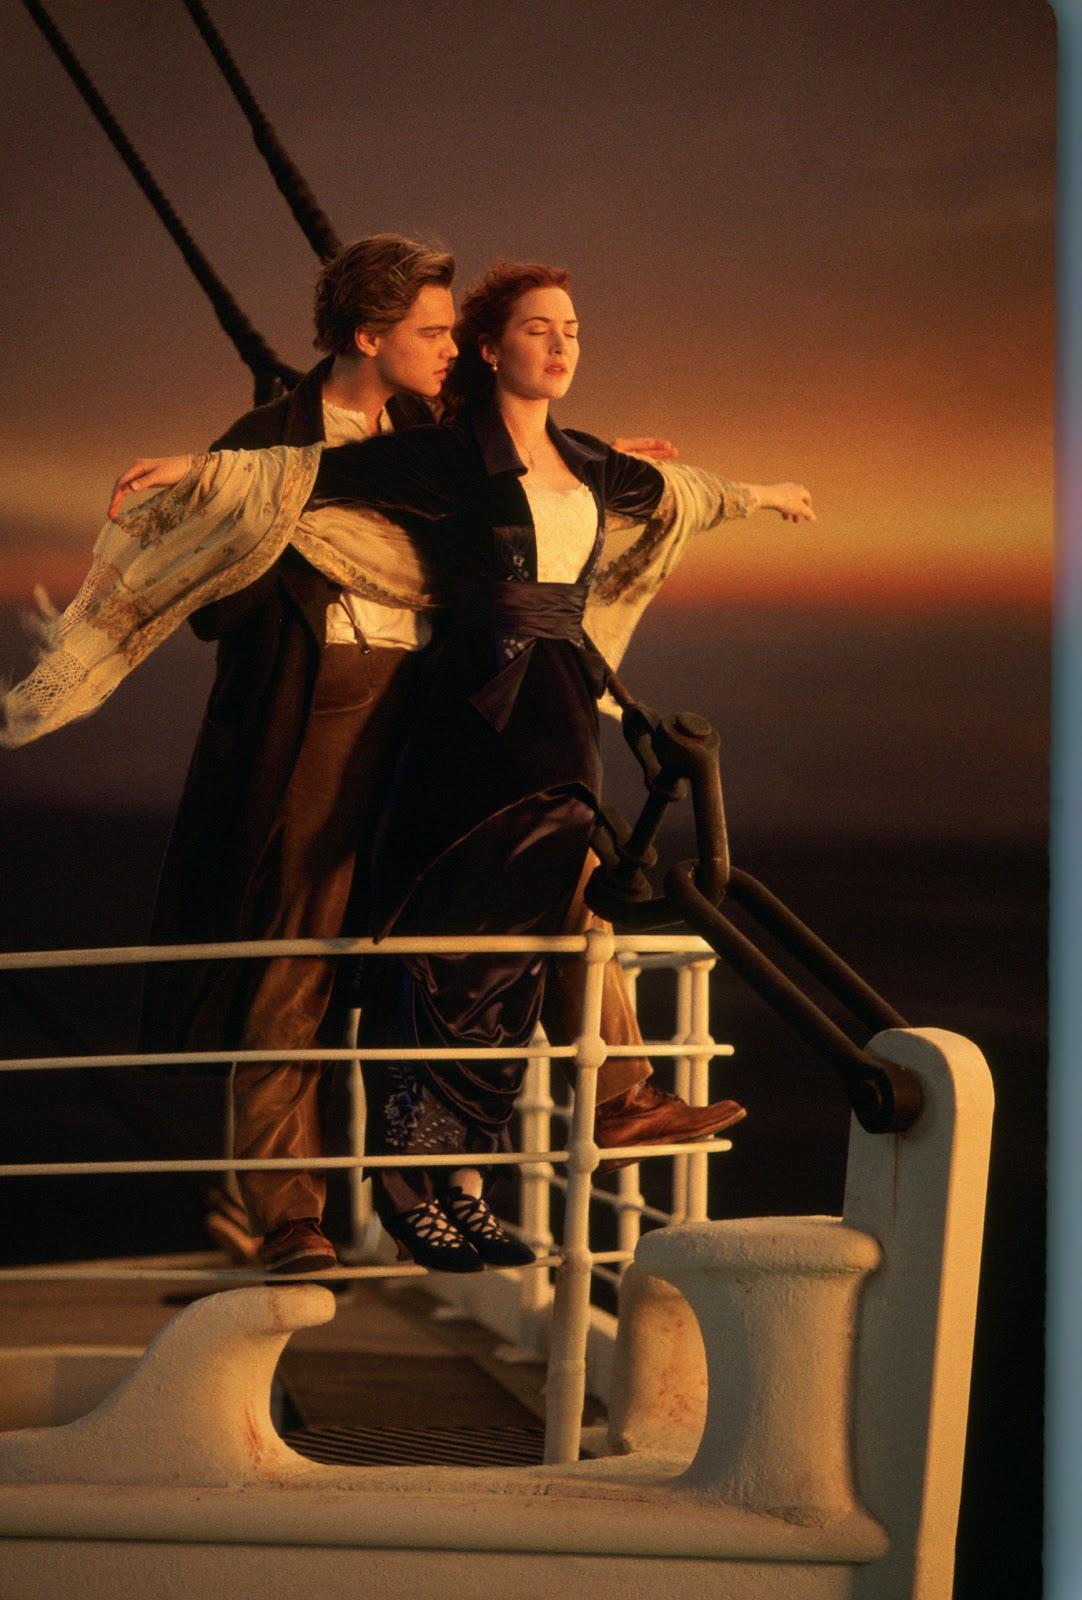 Kate Winslet Titanic Painting Scene Leonardo dicaprio titanic